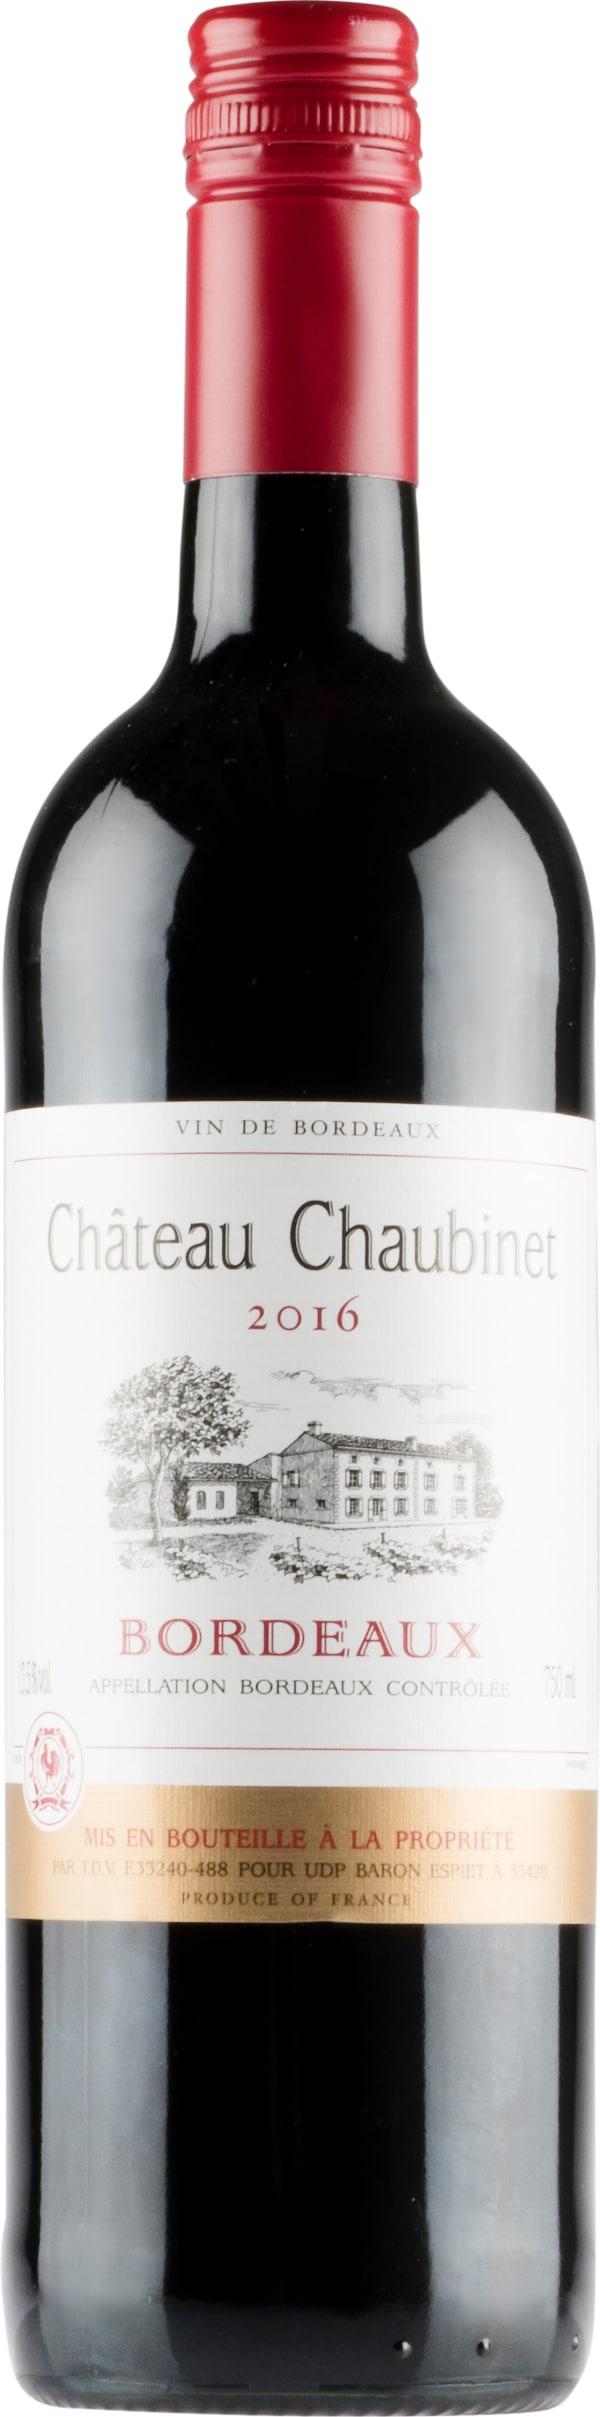 Château Chaubinet 2014